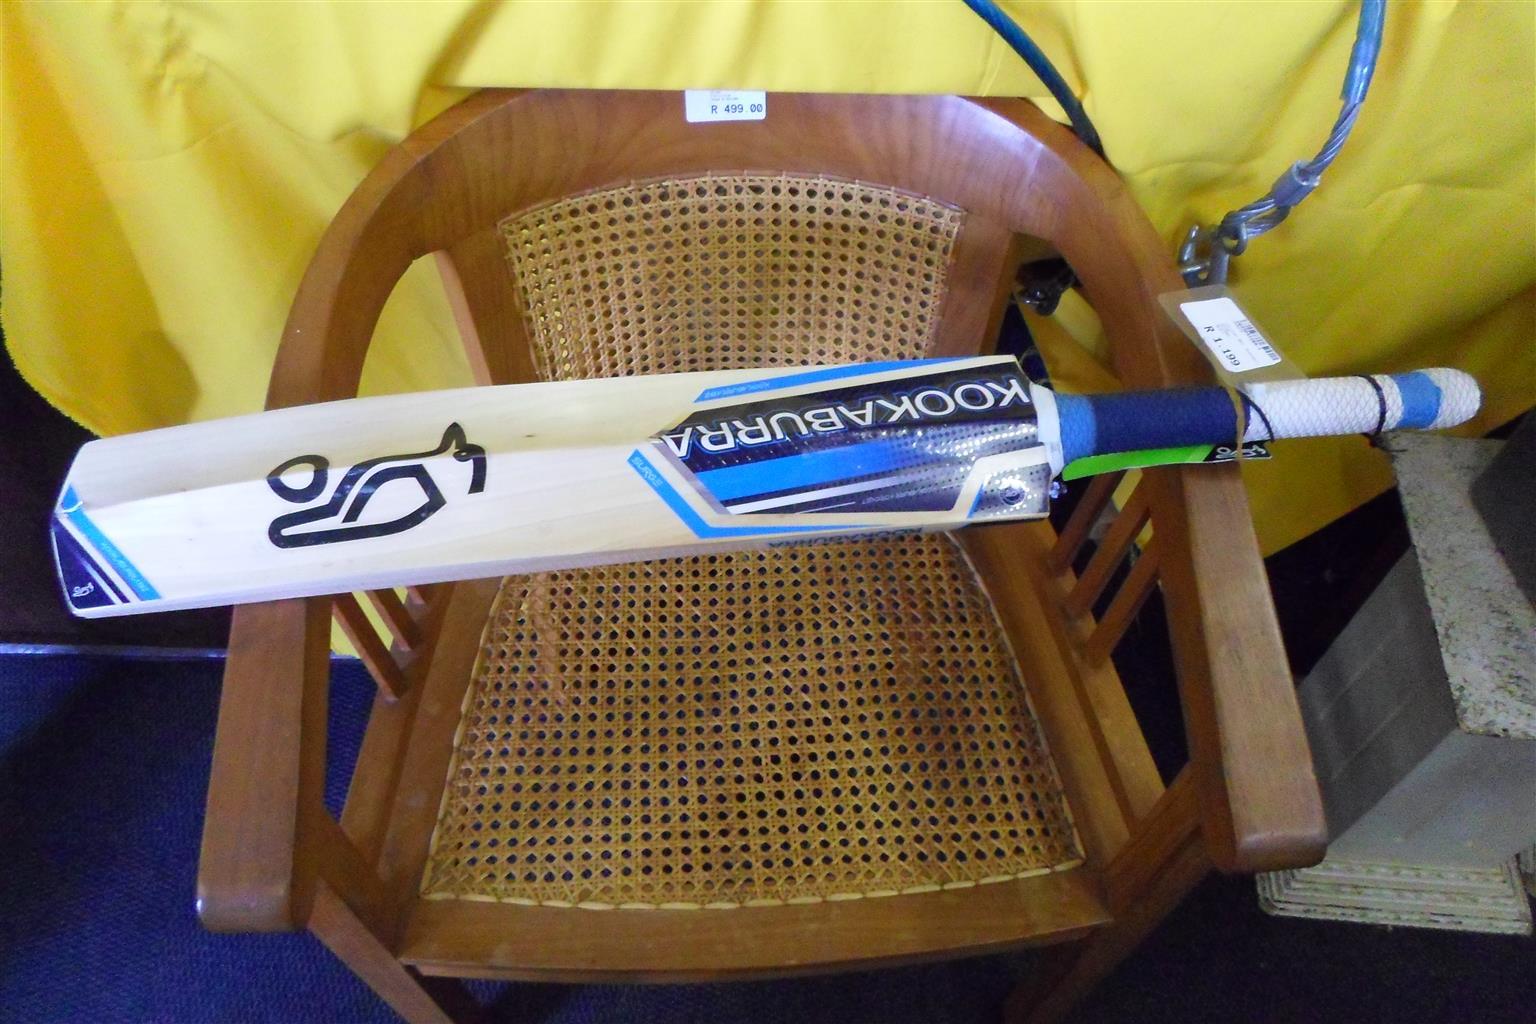 Kookaburra Surge Pro 1000 Cricket Bat